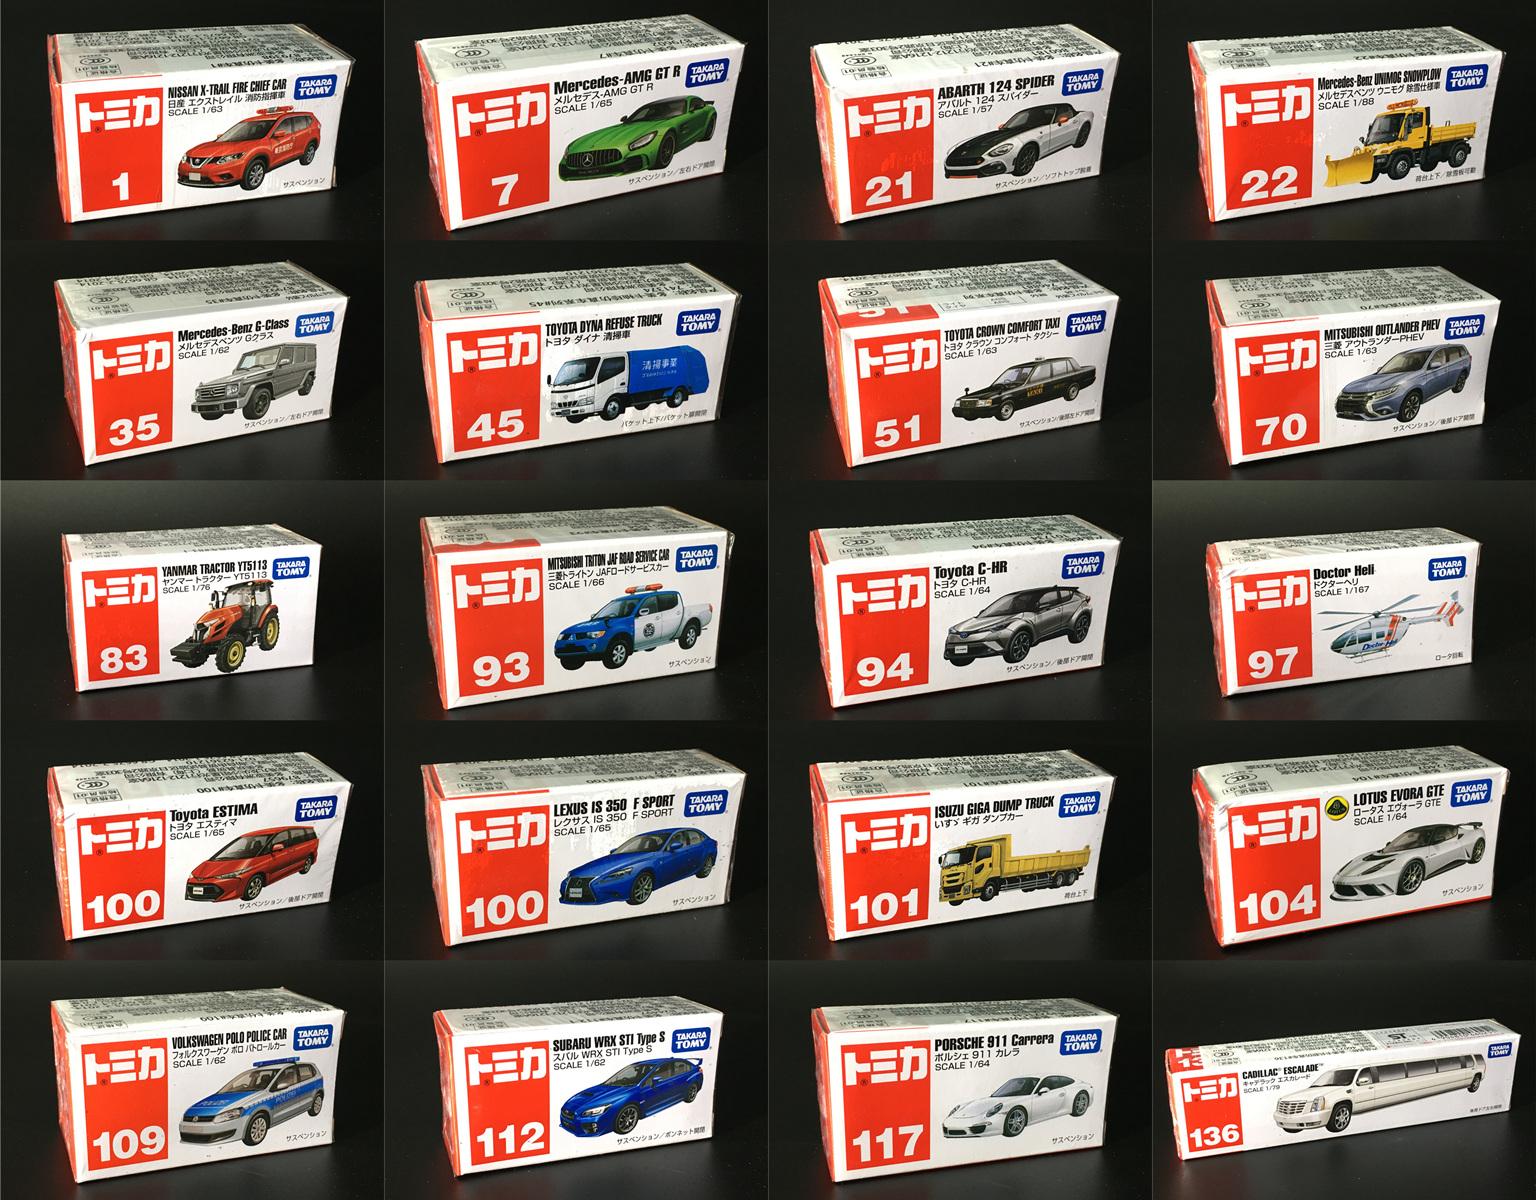 TOMY日本多美卡仿真合金小跑车模型玩具 工程拖车货车消防车奔驰